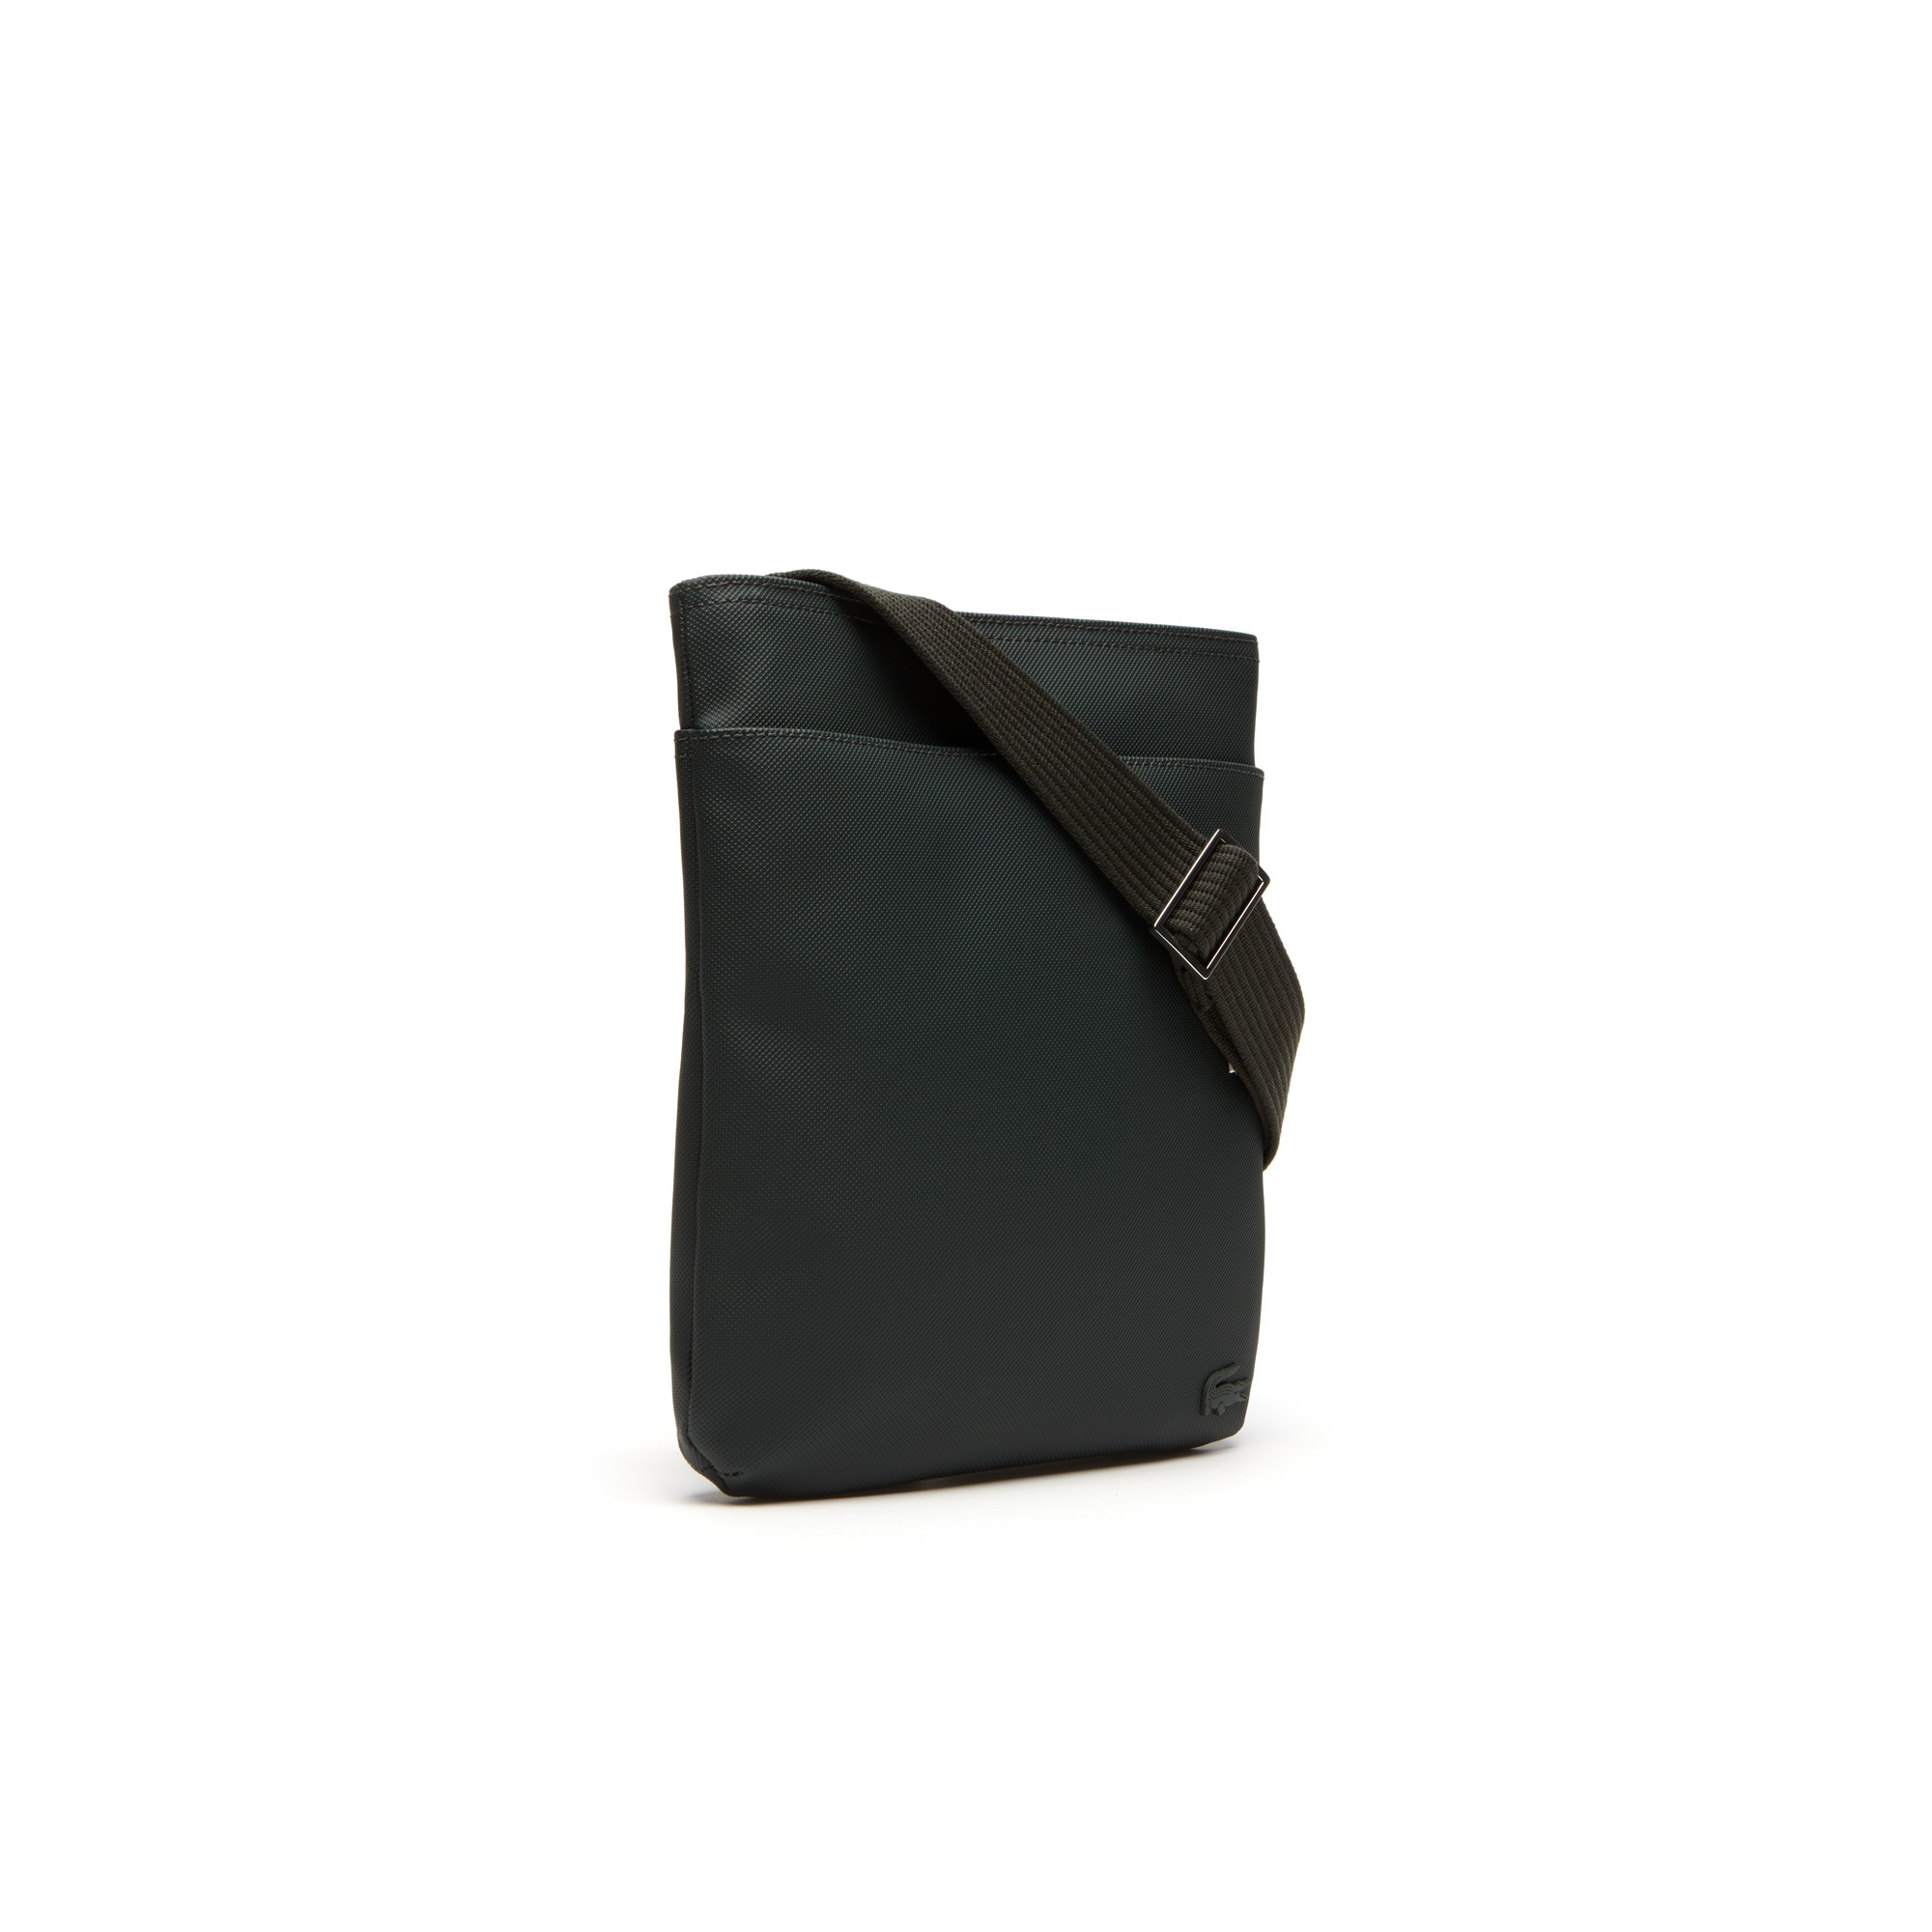 Lacoste - Flache Herren-Tasche CLASSIC aus Petit Piqué - 3